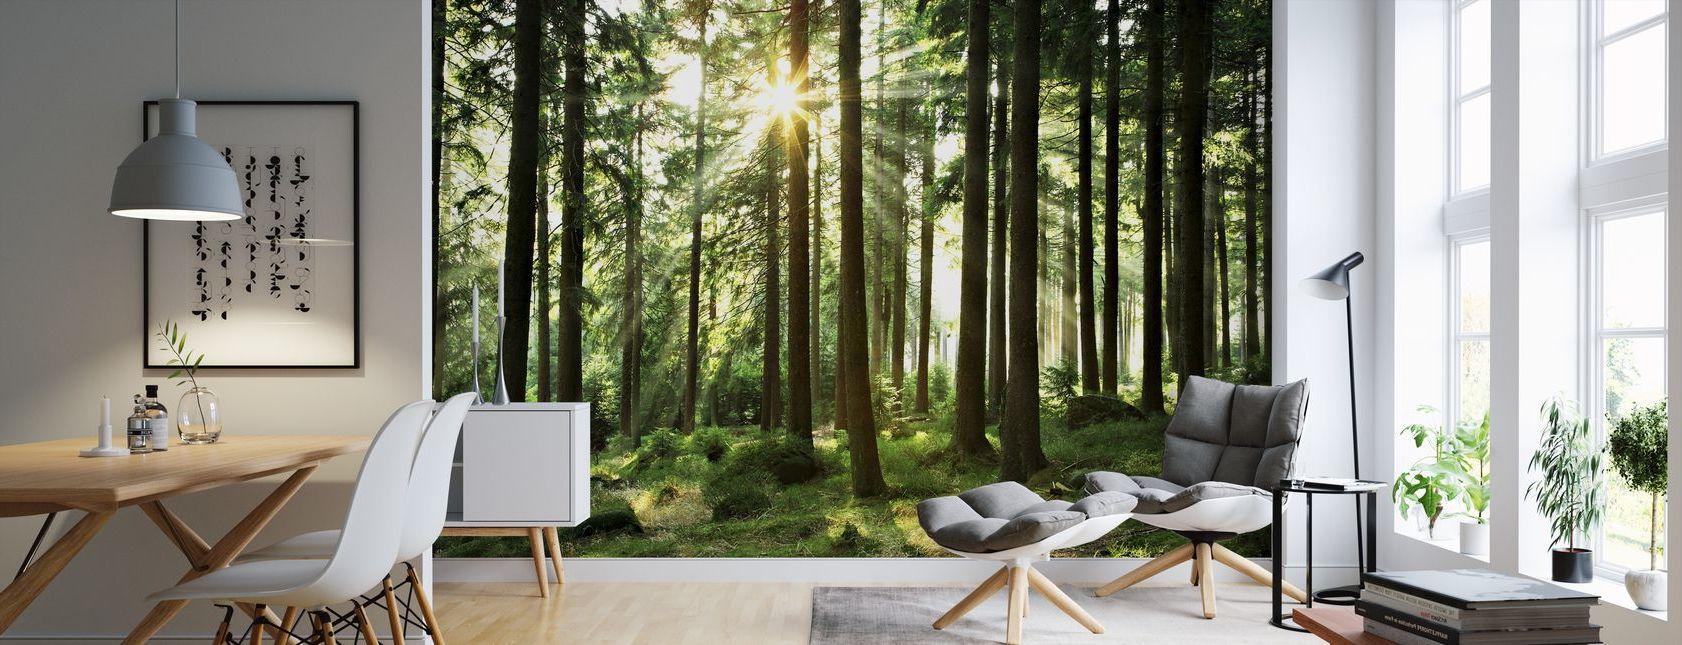 Fototapeten mit Wald Dekor